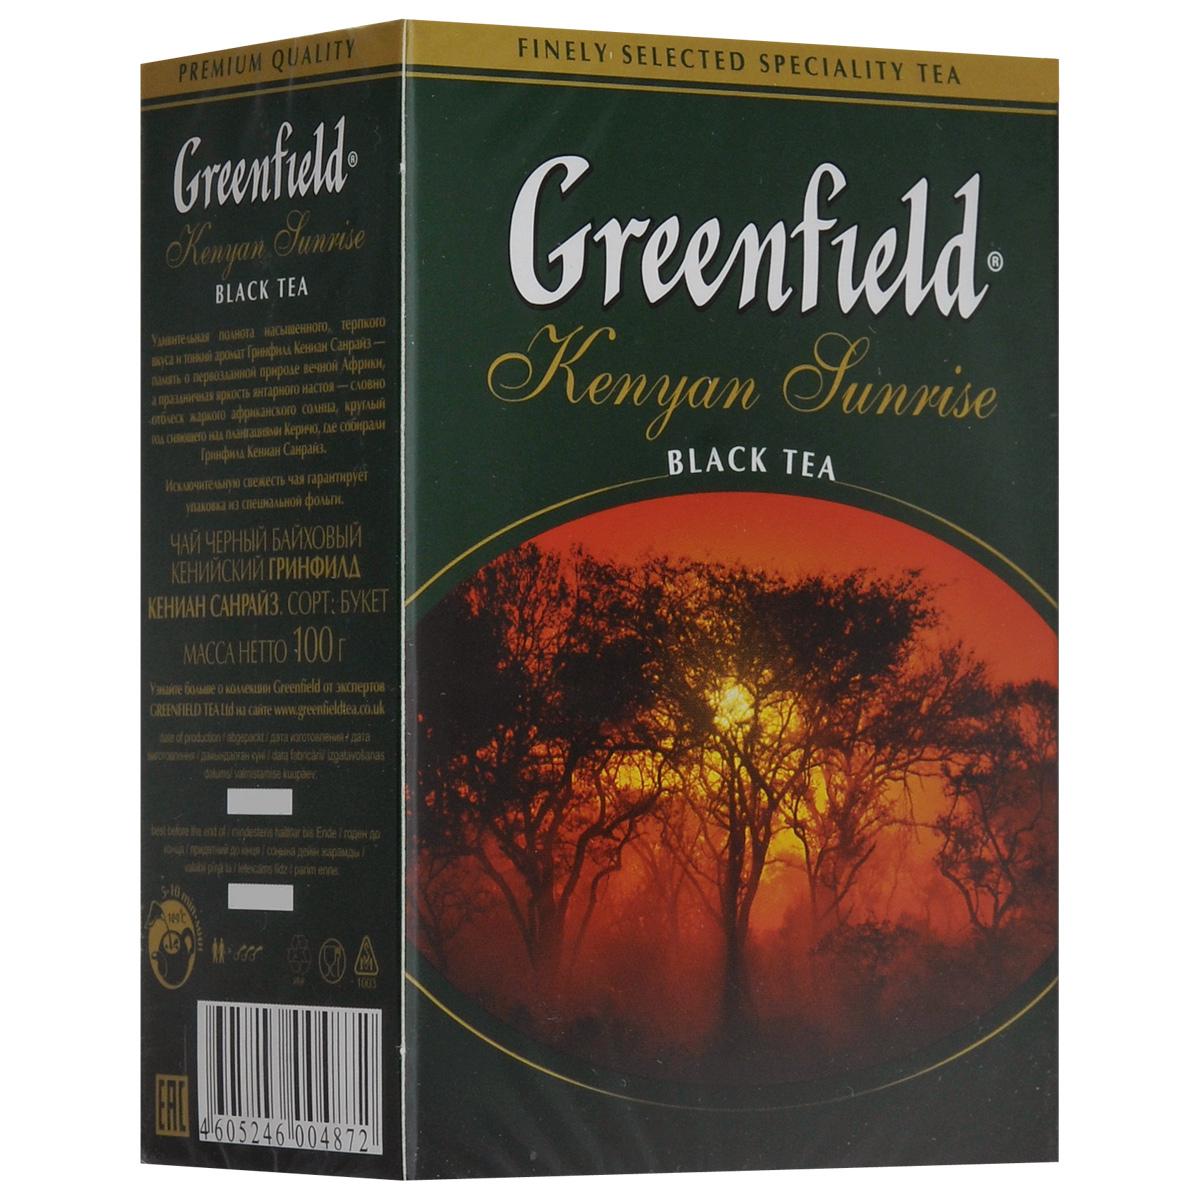 Greenfield Kenyan Sunrise черный листовой чай, 100 г greenfield blueberry forest черный листовой чай 250 г